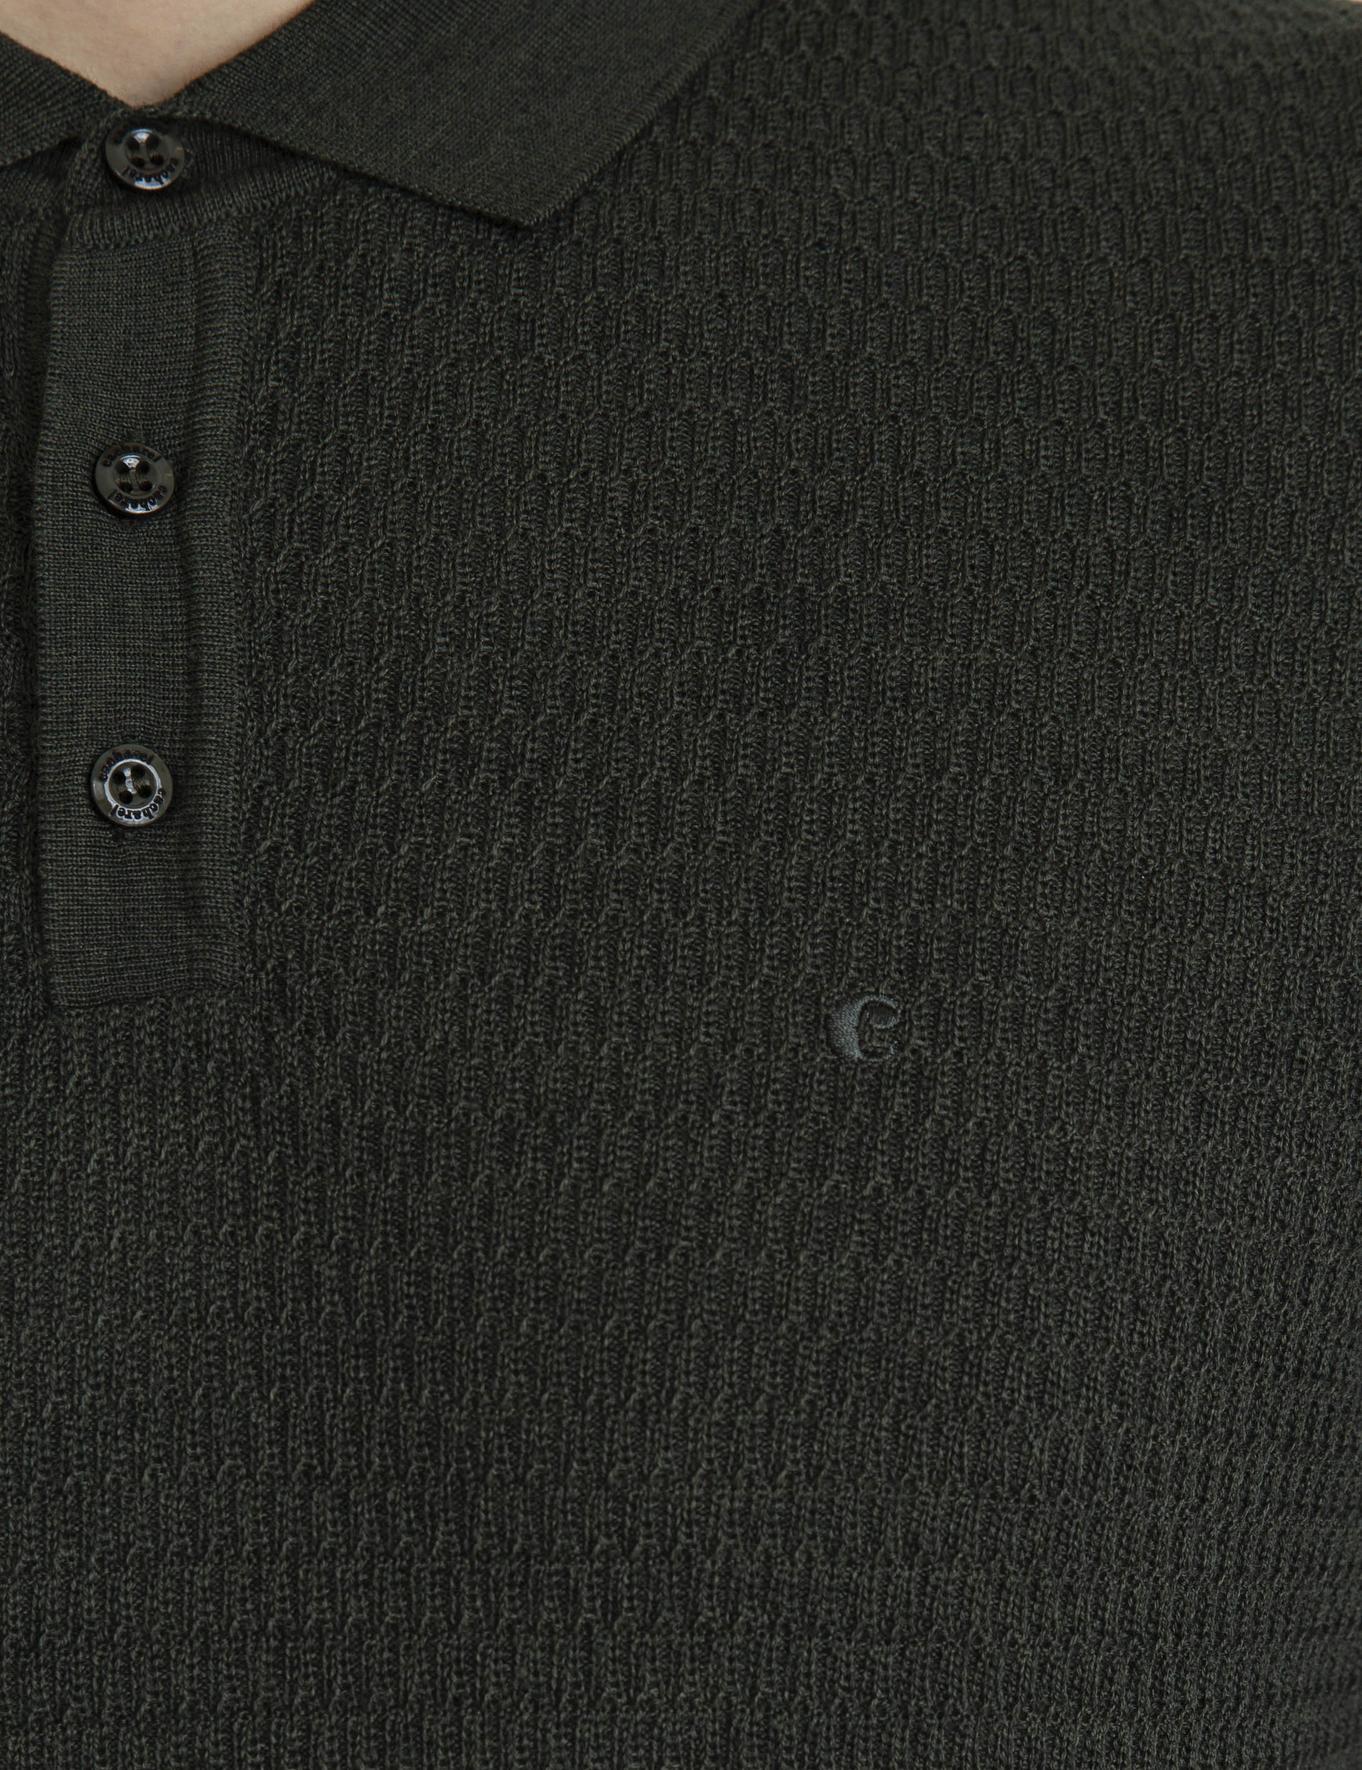 Polo Yaka Kazak - 50230059010